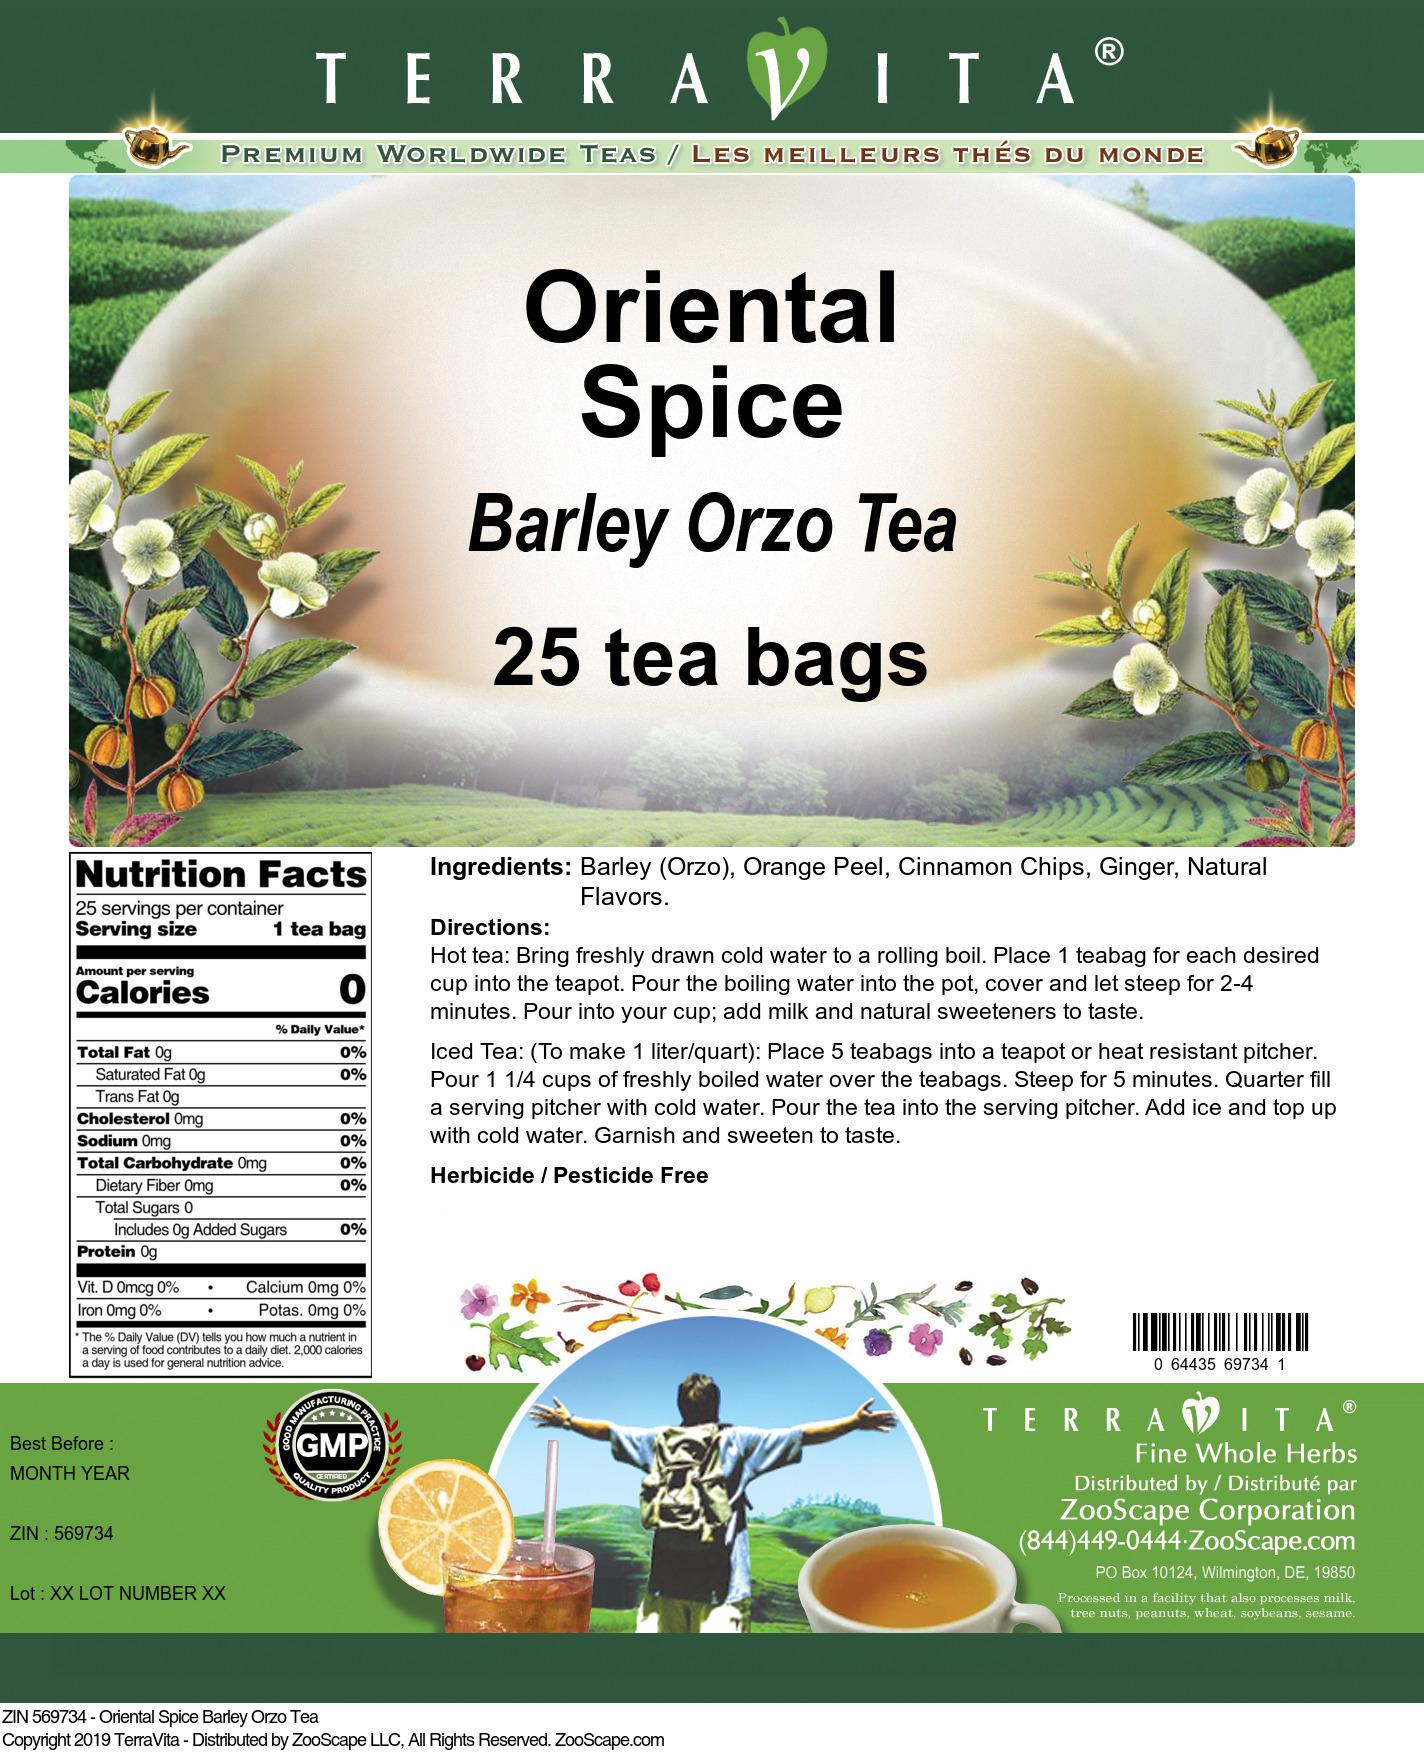 Oriental Spice Barley Orzo Tea